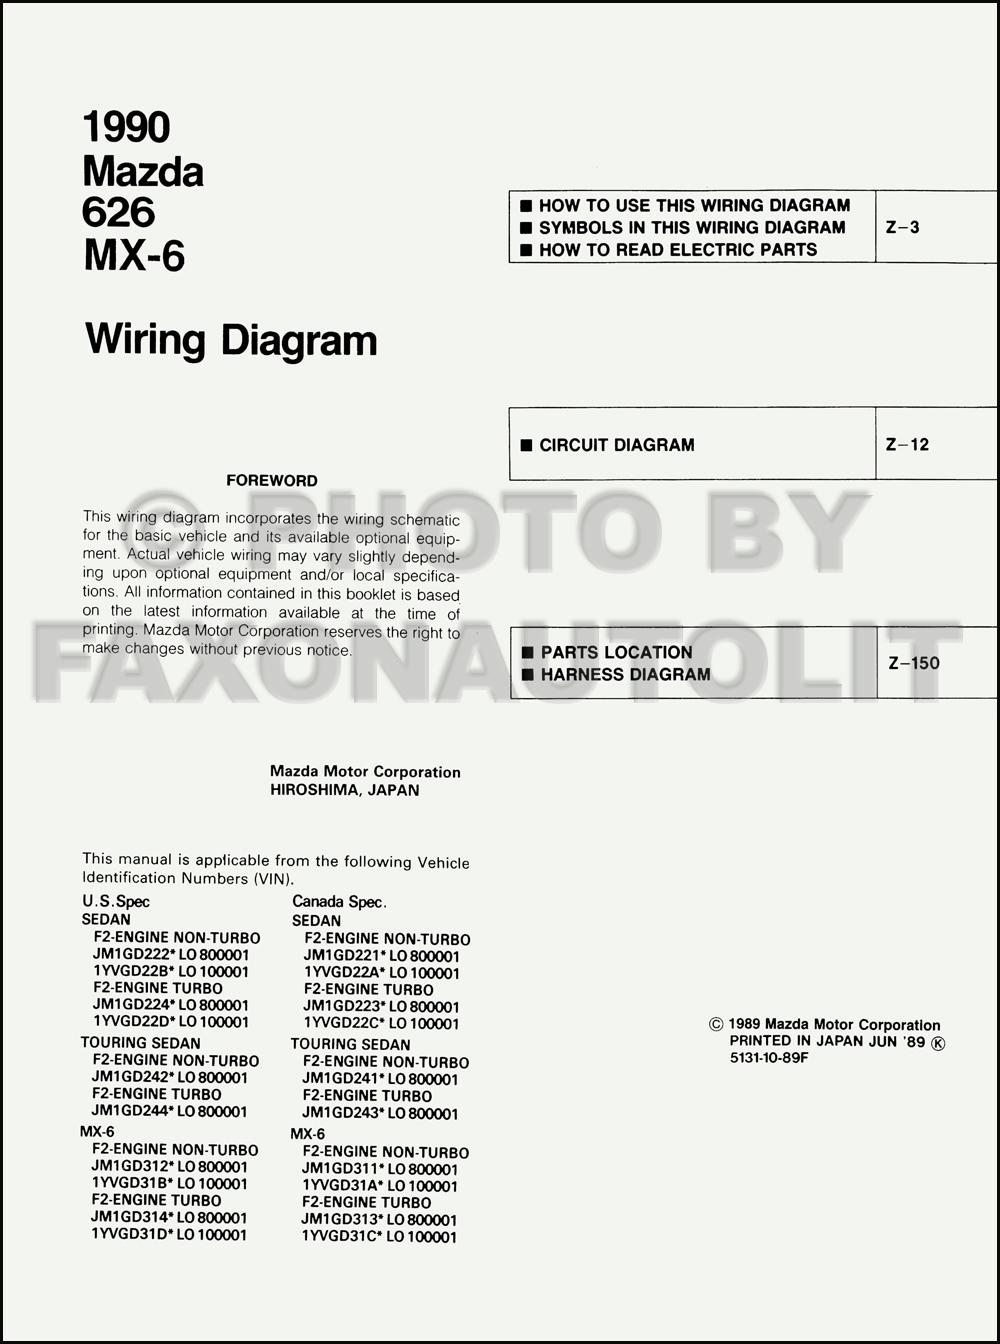 Mazda 626 Wiring Diagram Service Manual : Mazda and mx wiring diagram manual original